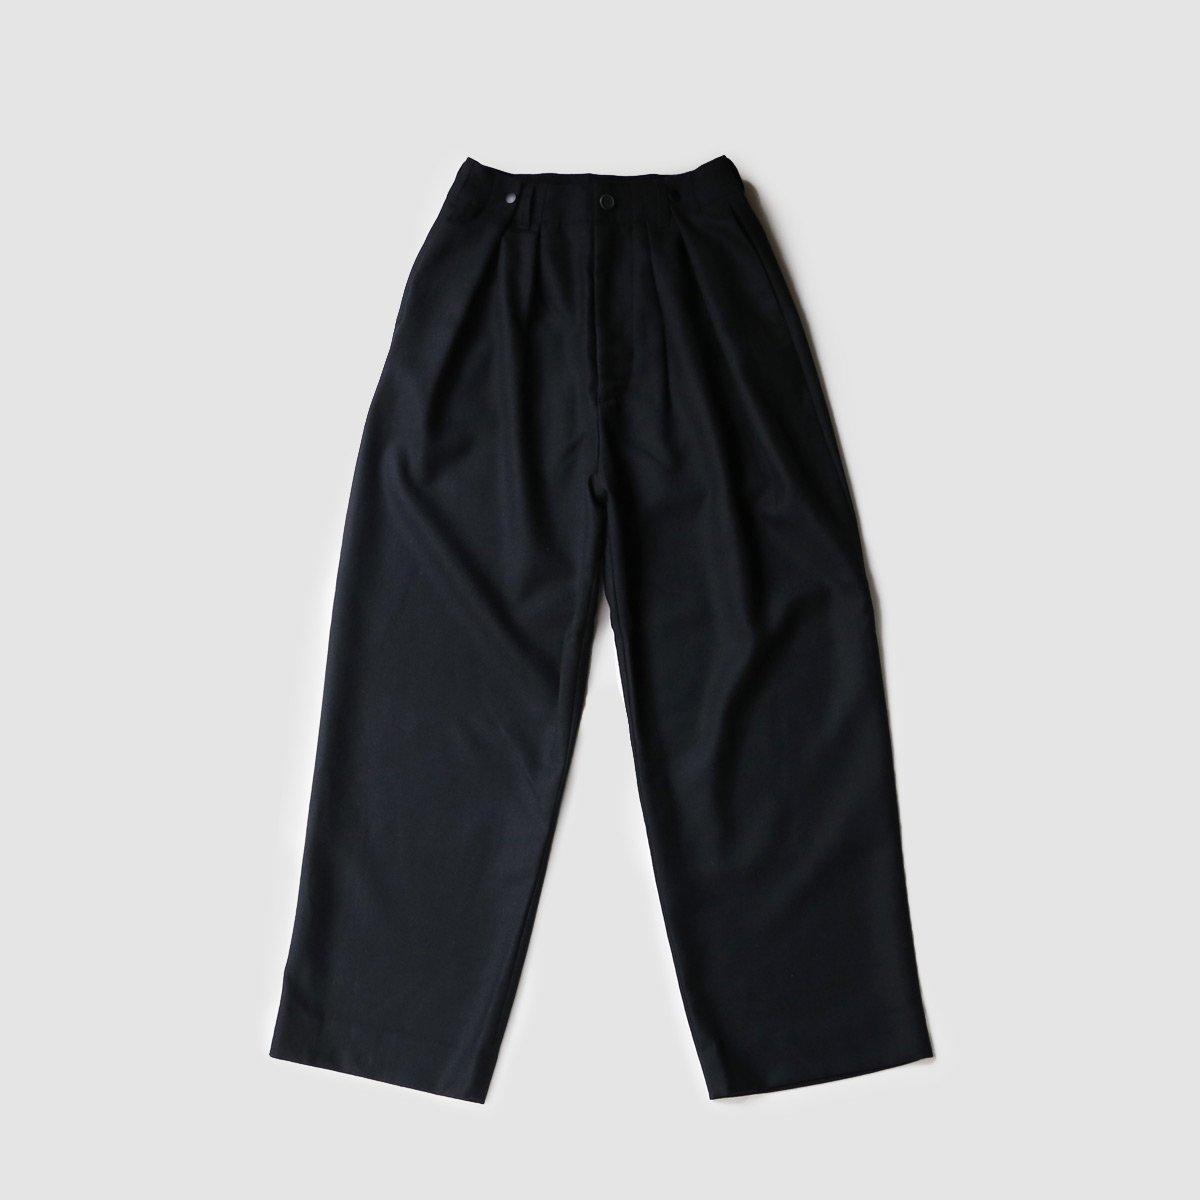 FREETUCK  PANTS 詳細画像1